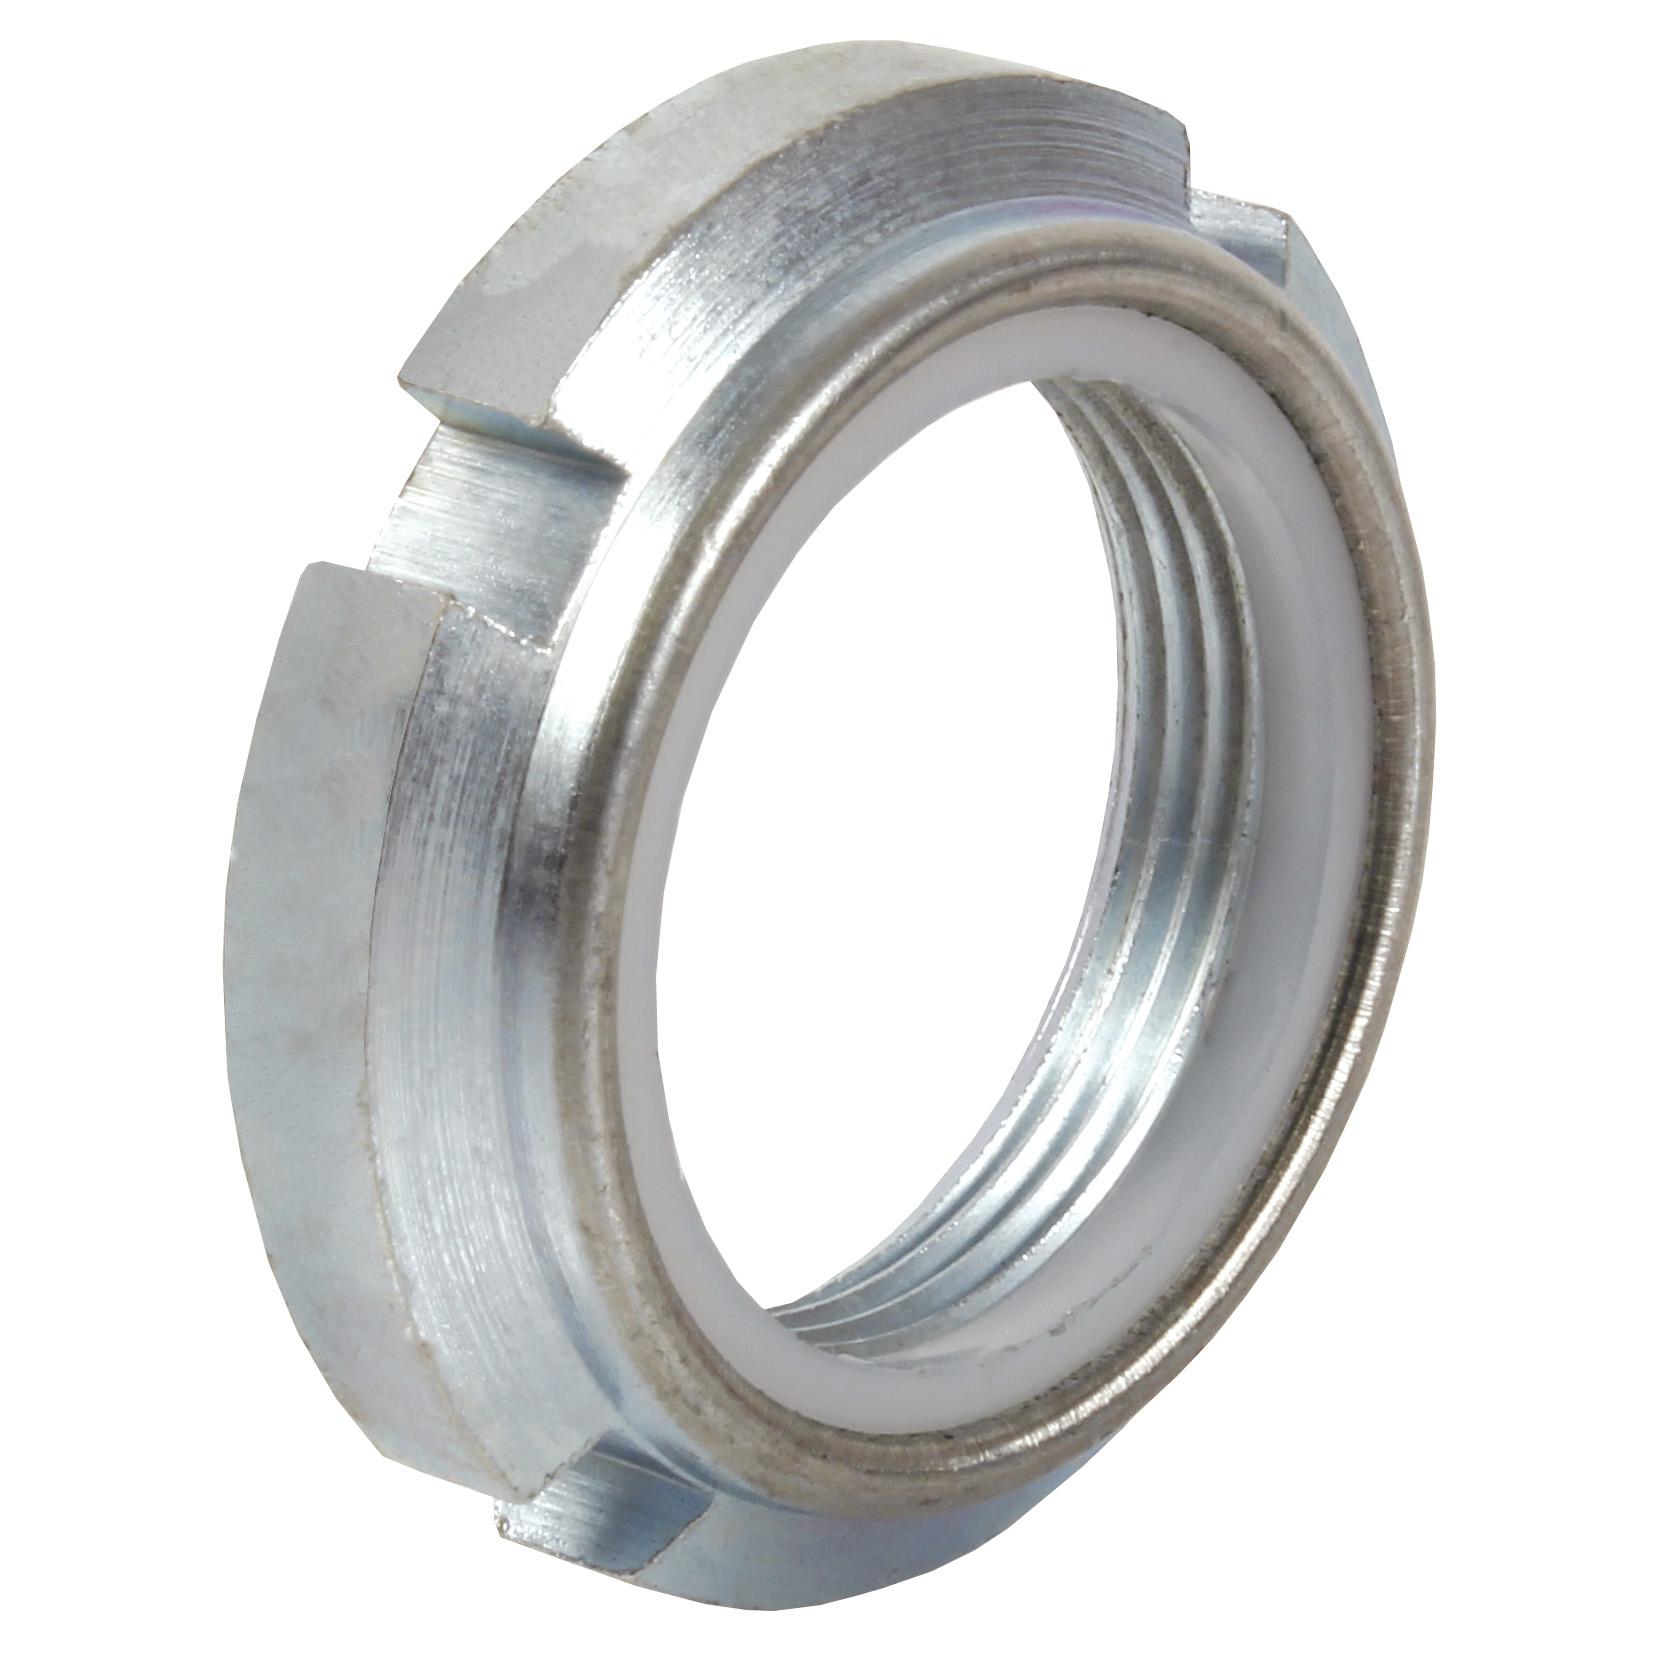 Bearing - accessories - Self locking locknut - nylon lock washer - Self-braking -